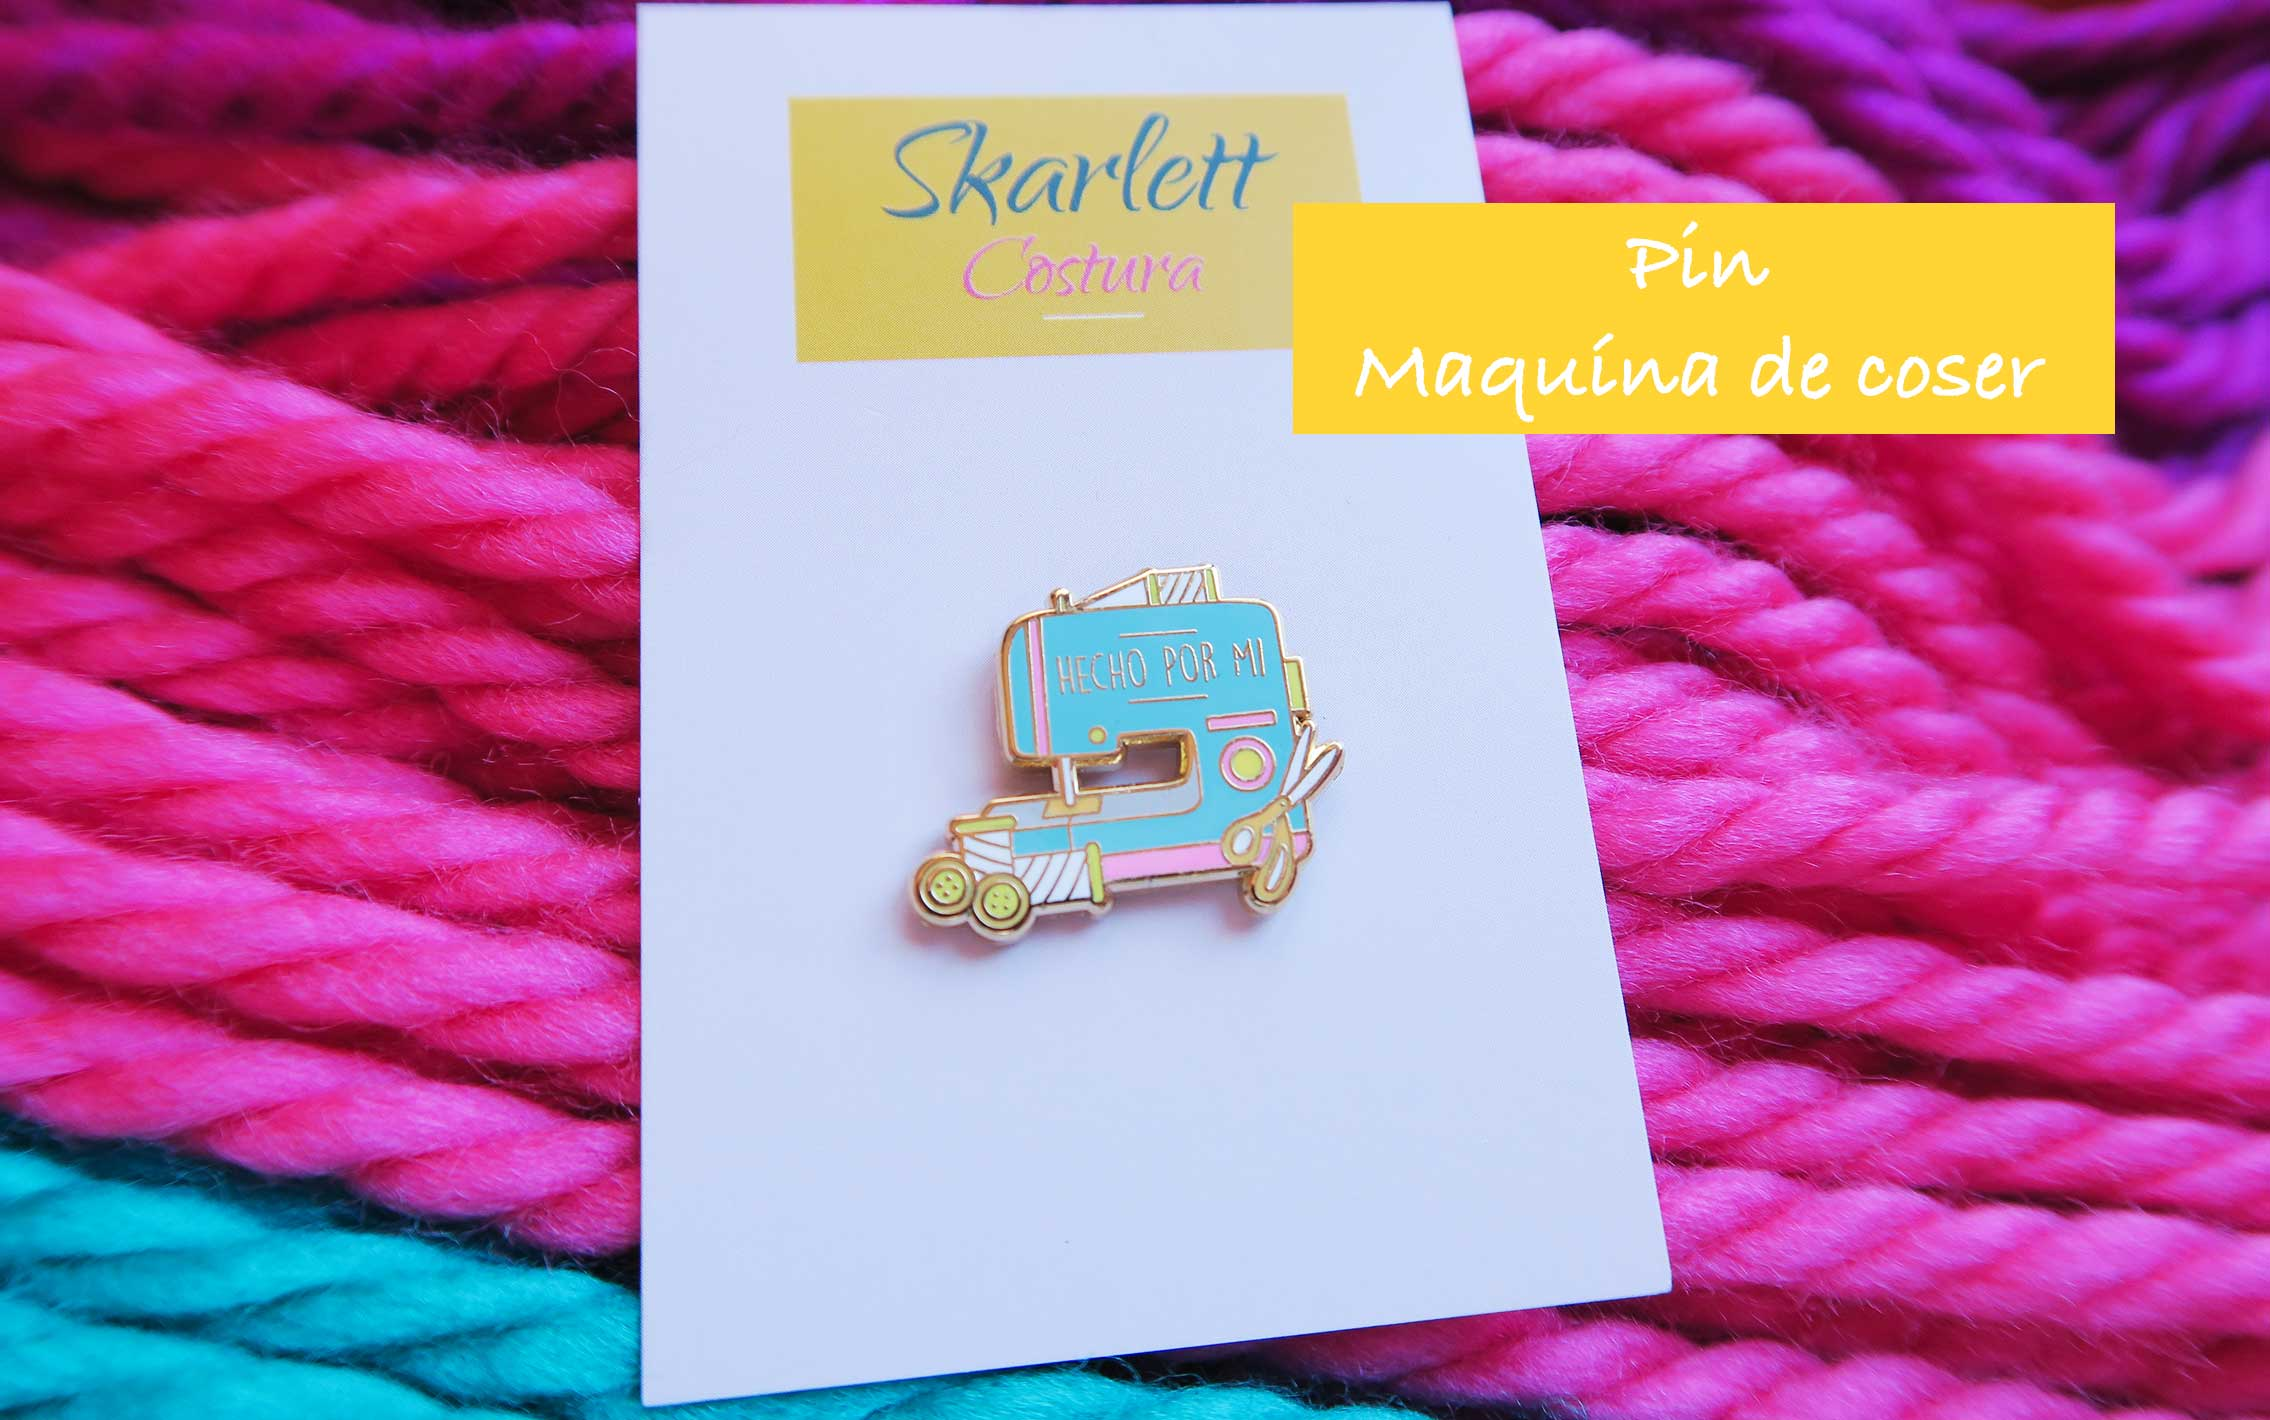 Pin-maquina-de-coser-skarlett-costura-carrusel